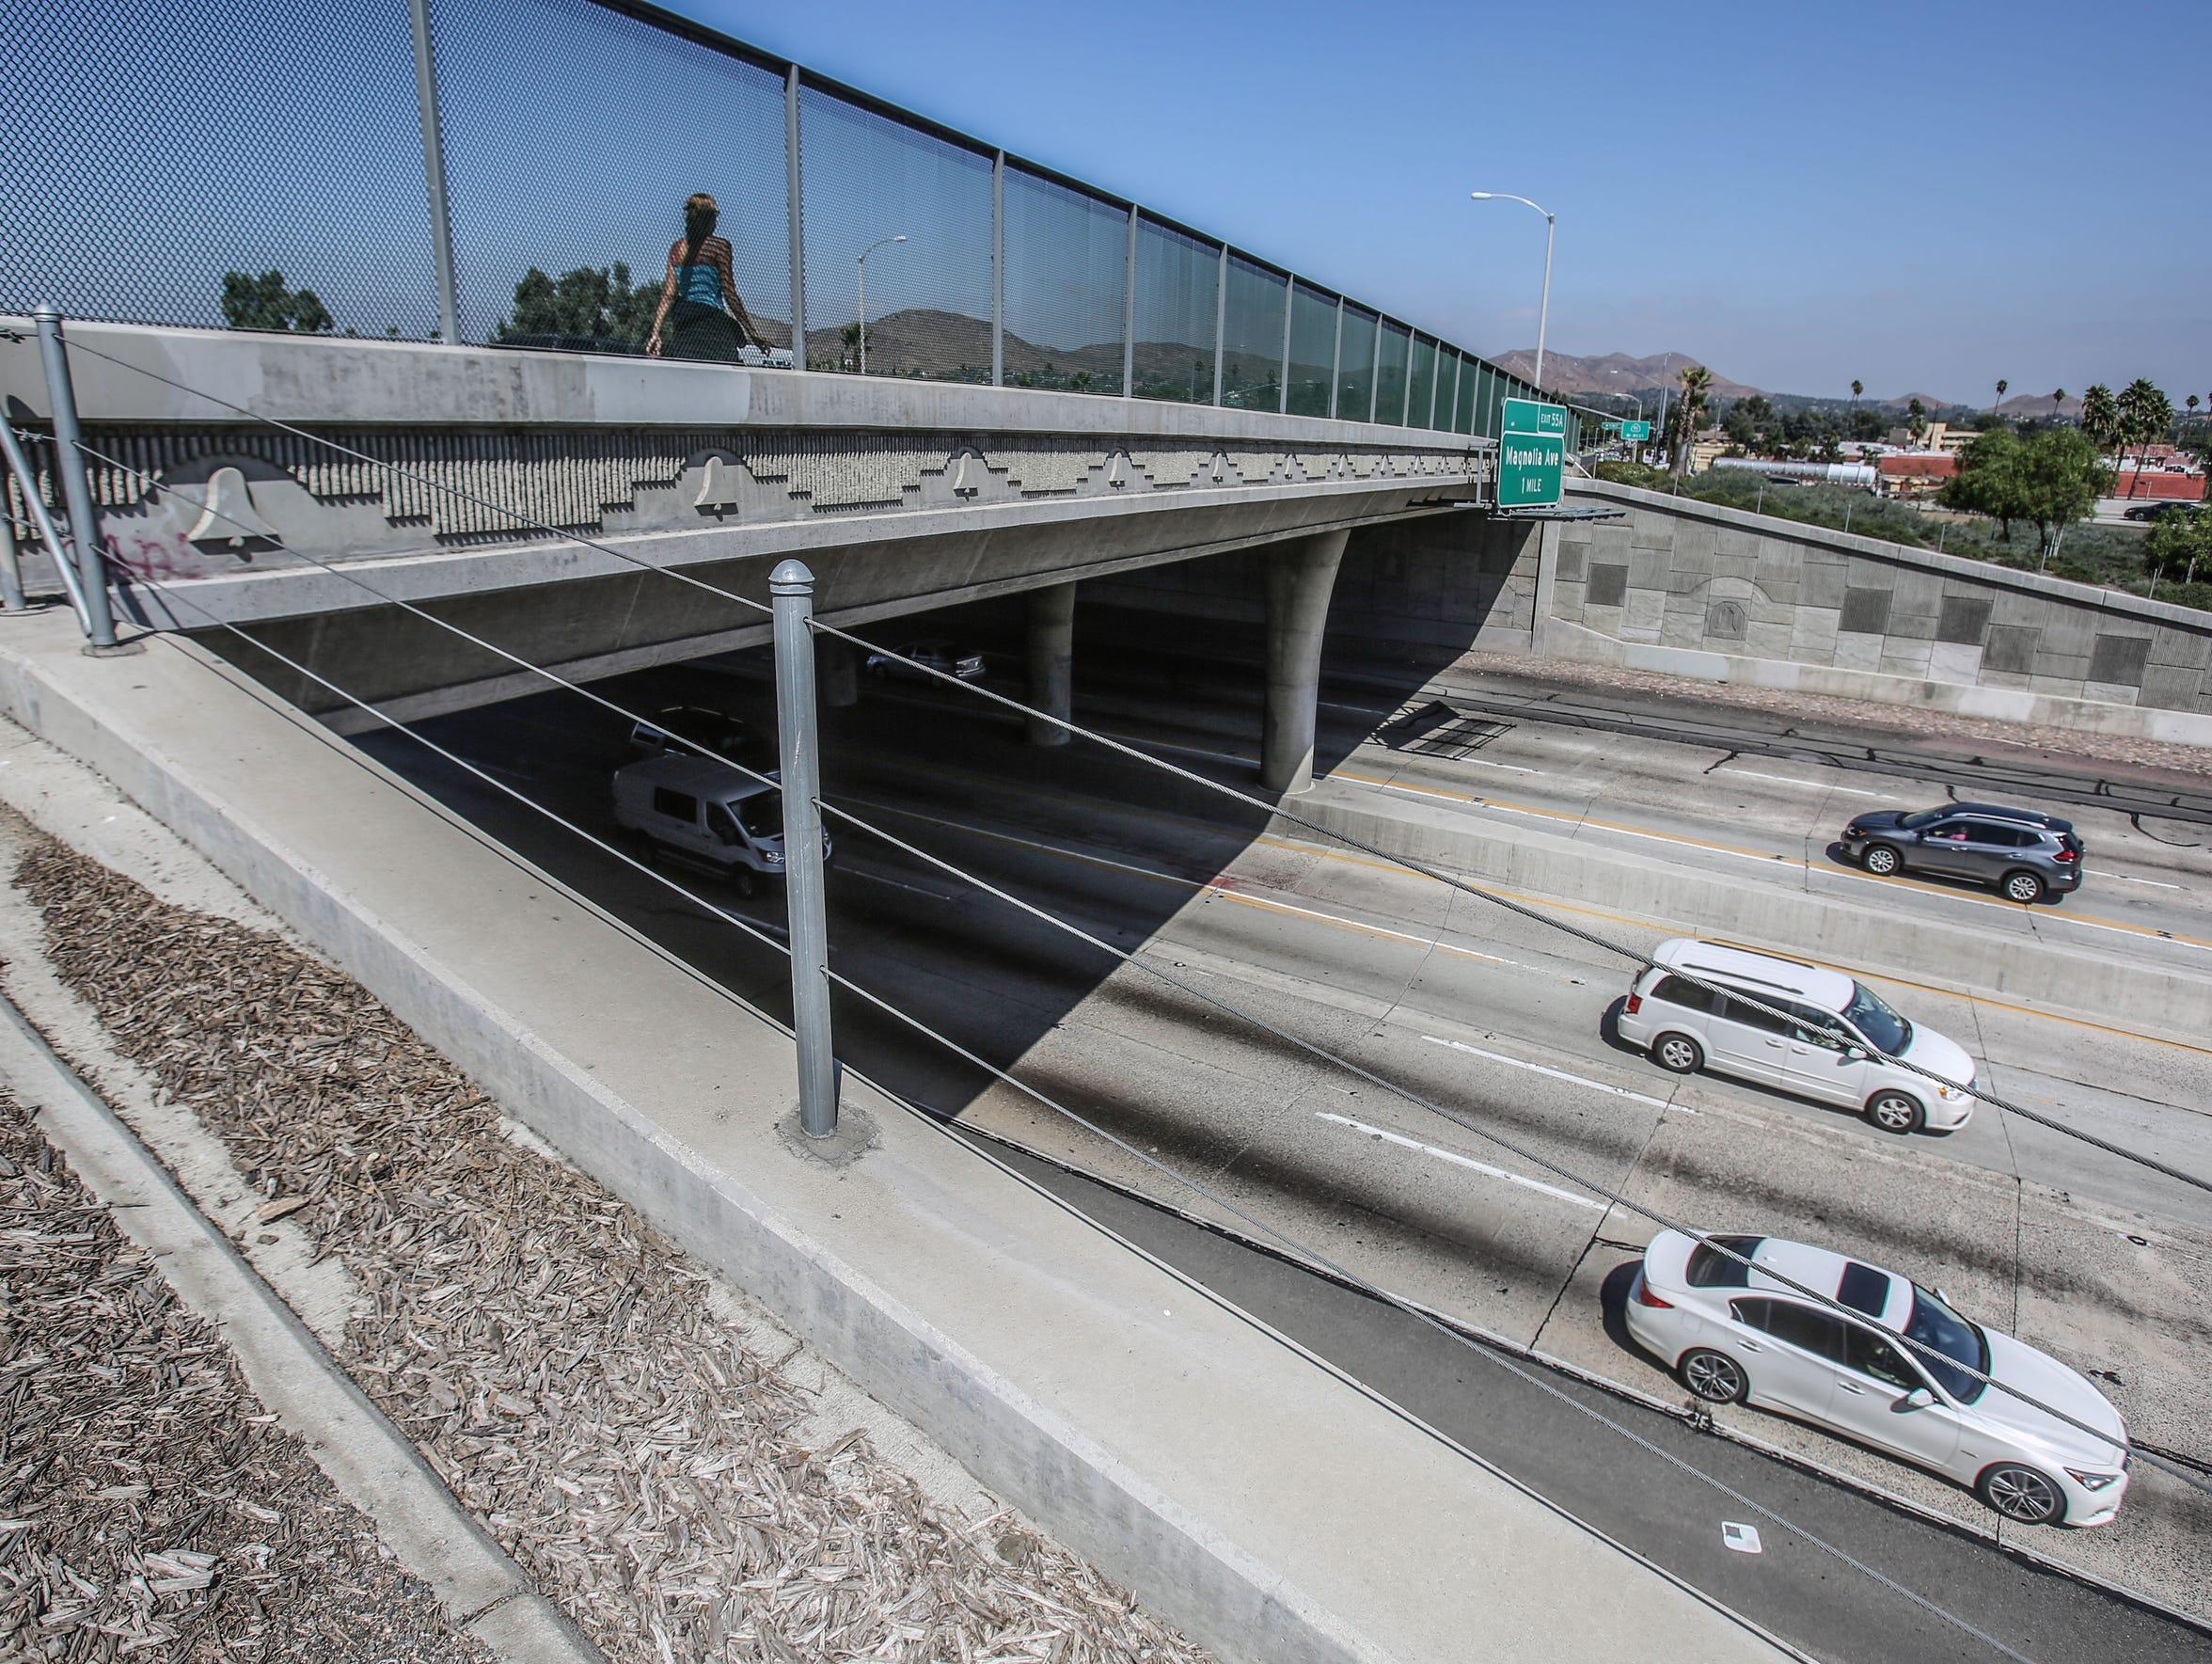 The La Sierra Avenue overpass, where Dane Norem was